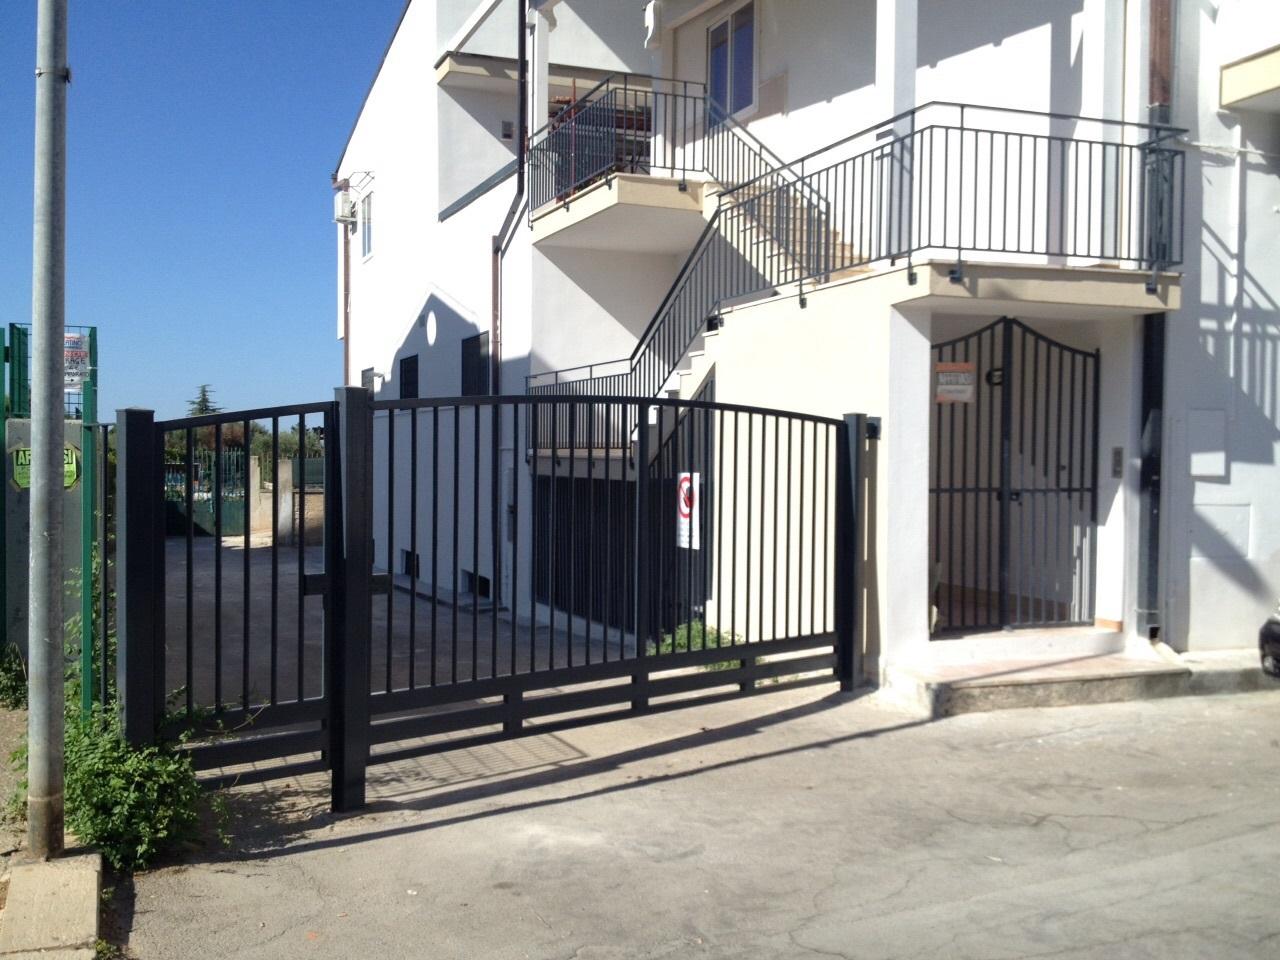 SANNICANDRO DI BARI – GARAGE